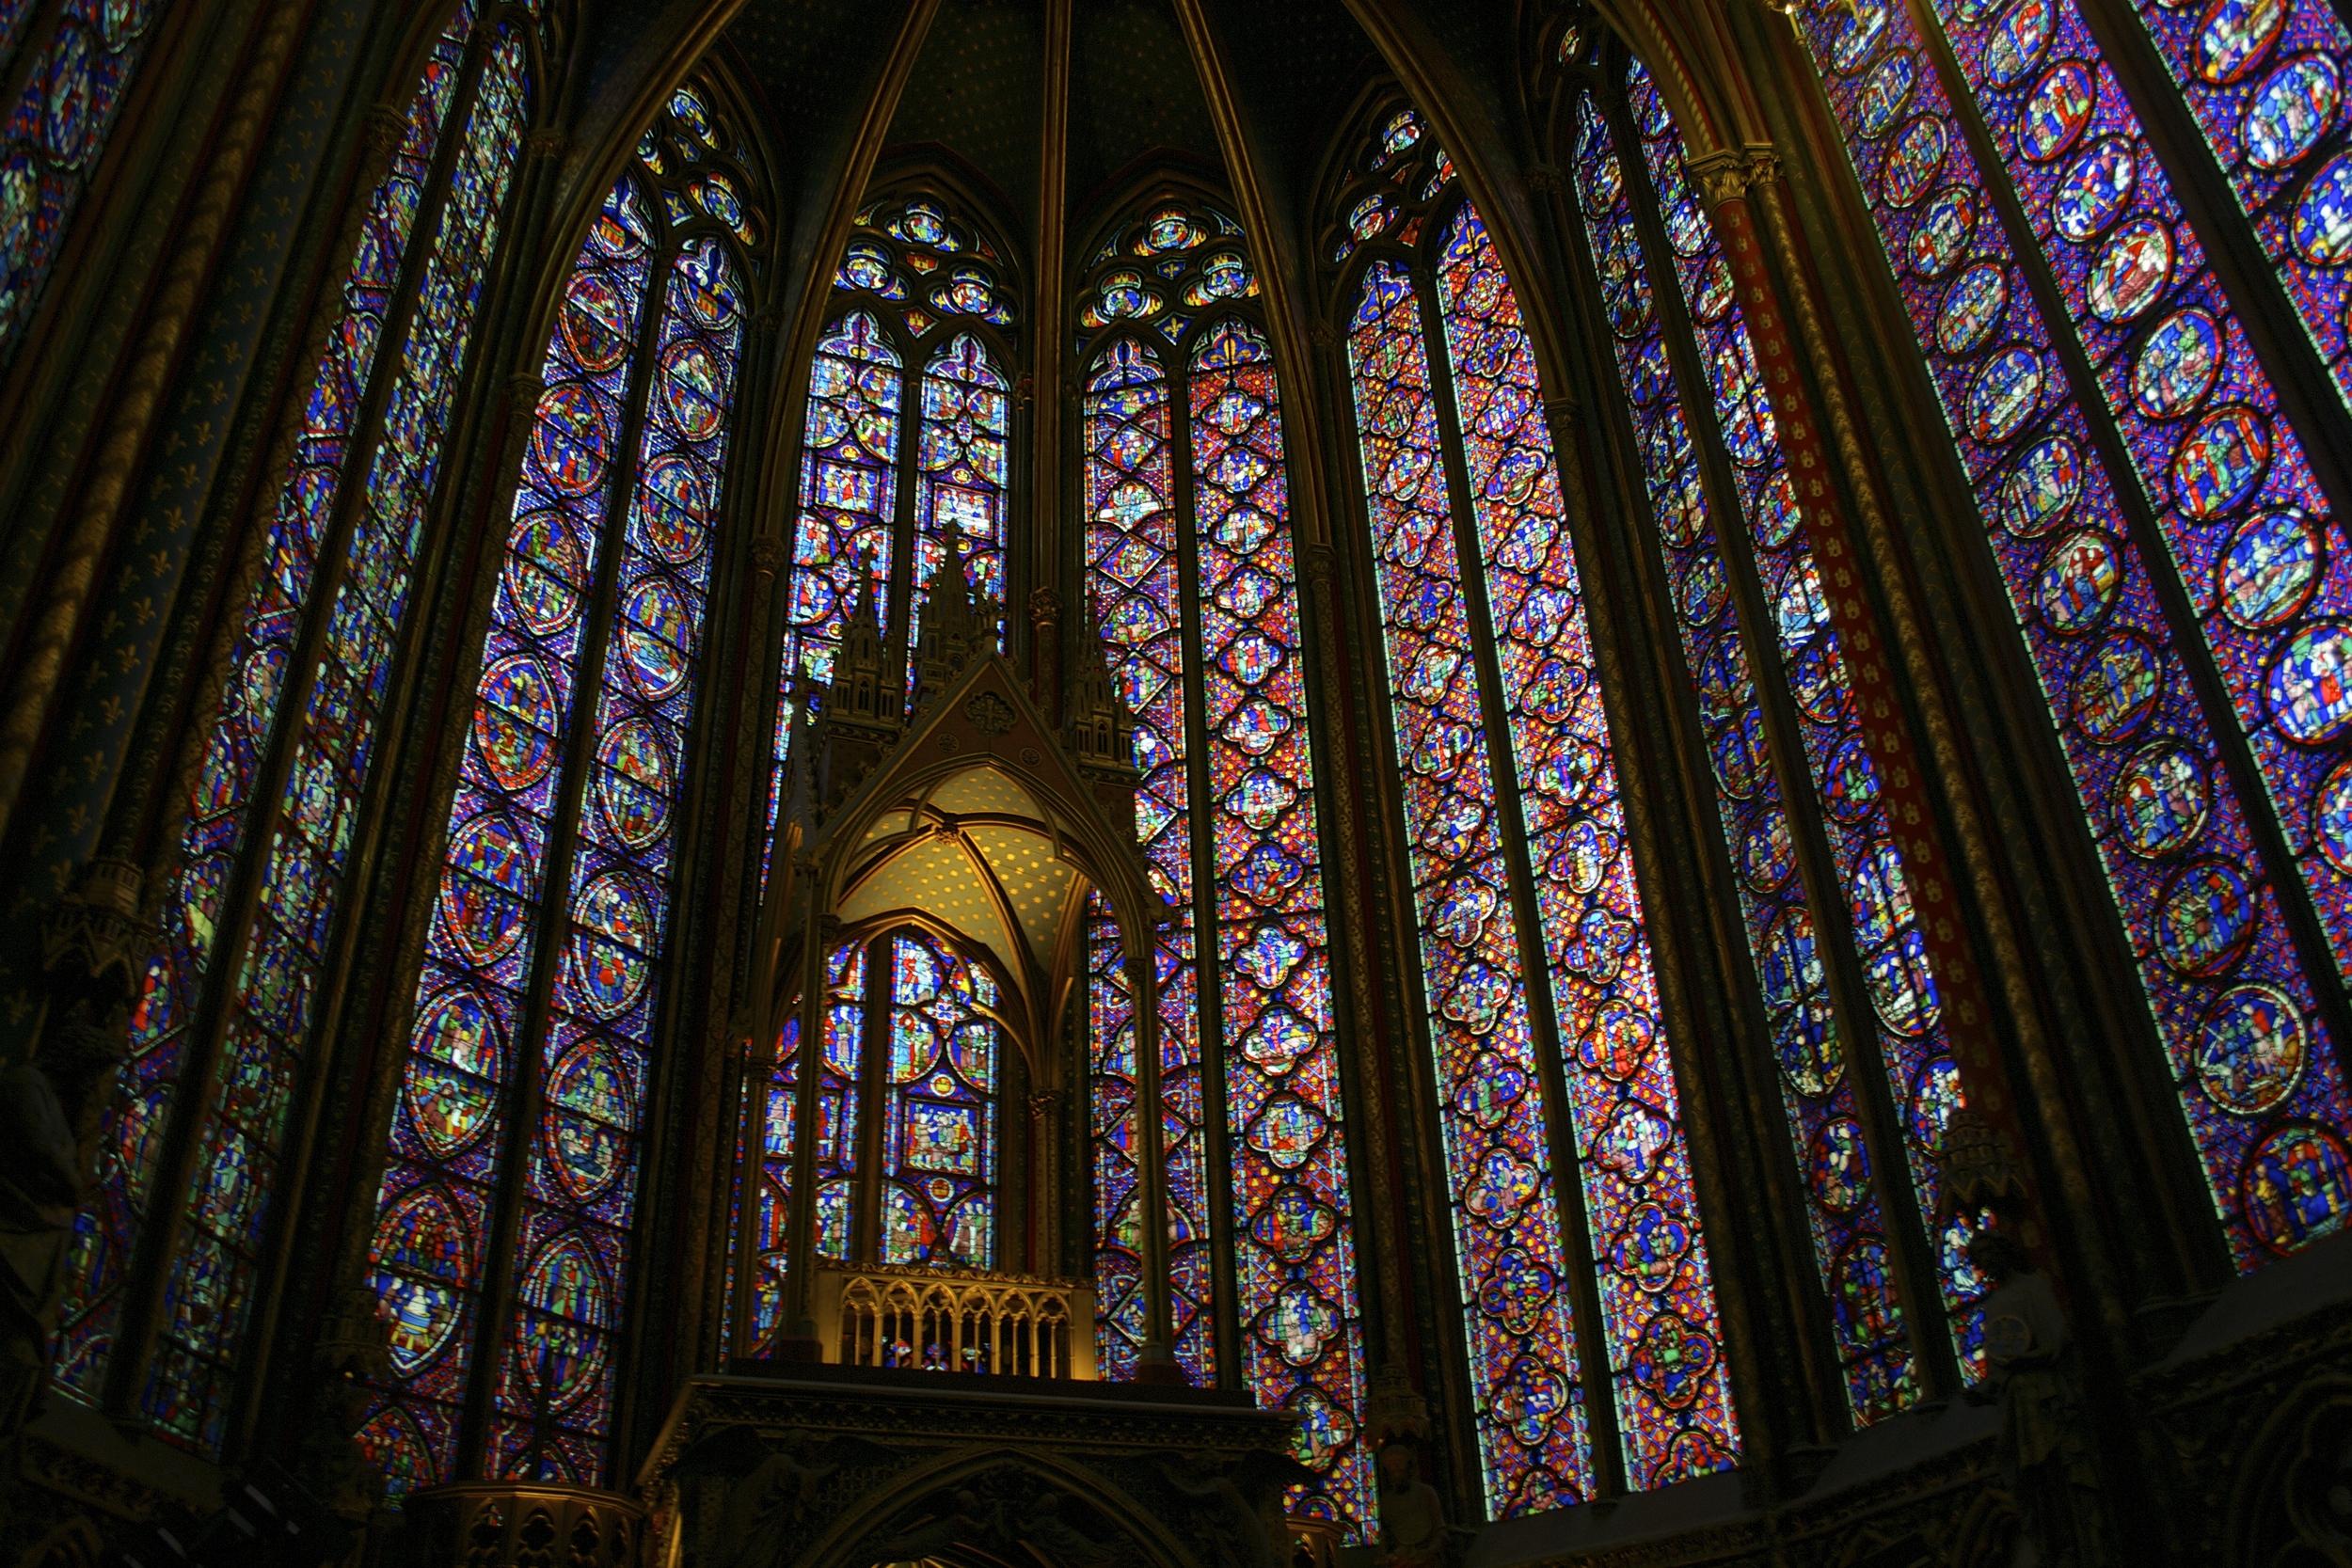 Inside Sainte-Chapelle